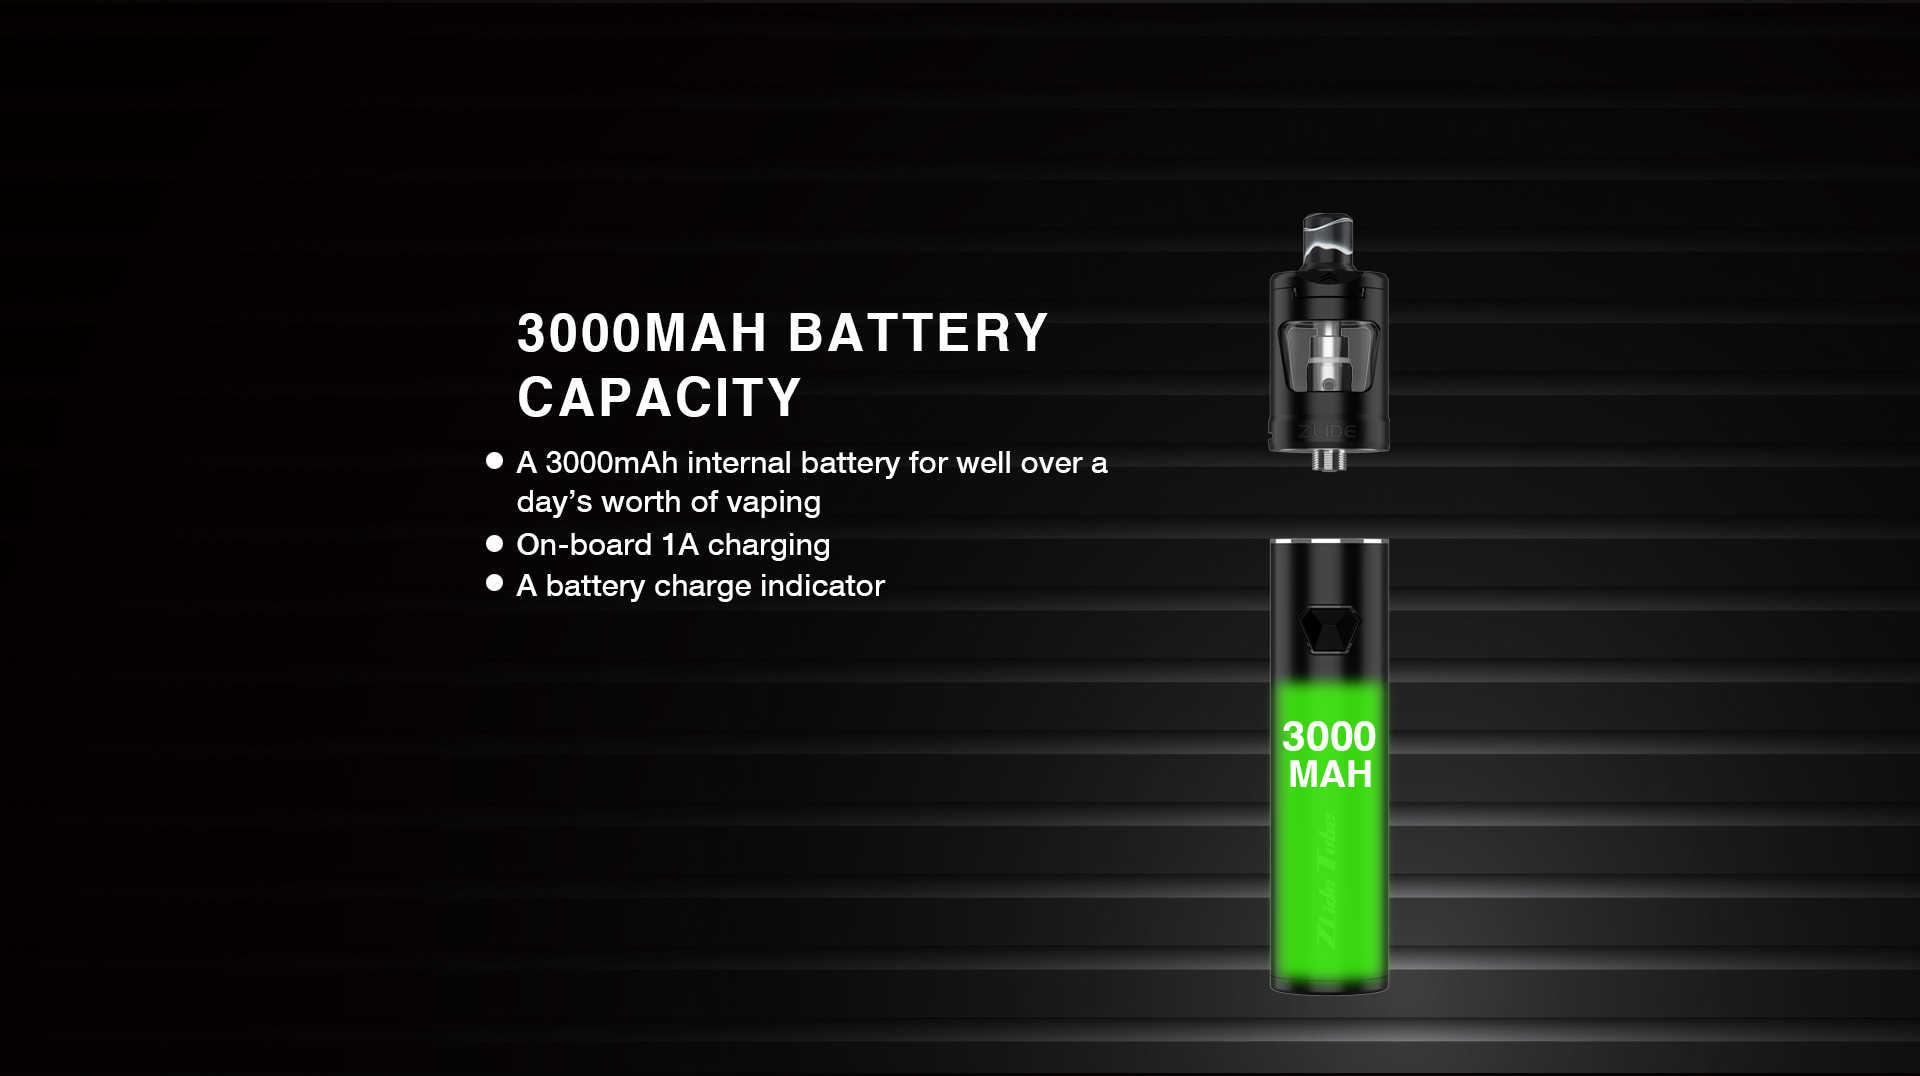 Kit Zlide Tube 3000mah avec clearomiseur Zlide 4ml - Innokin - Autonomie de 3000 mAh